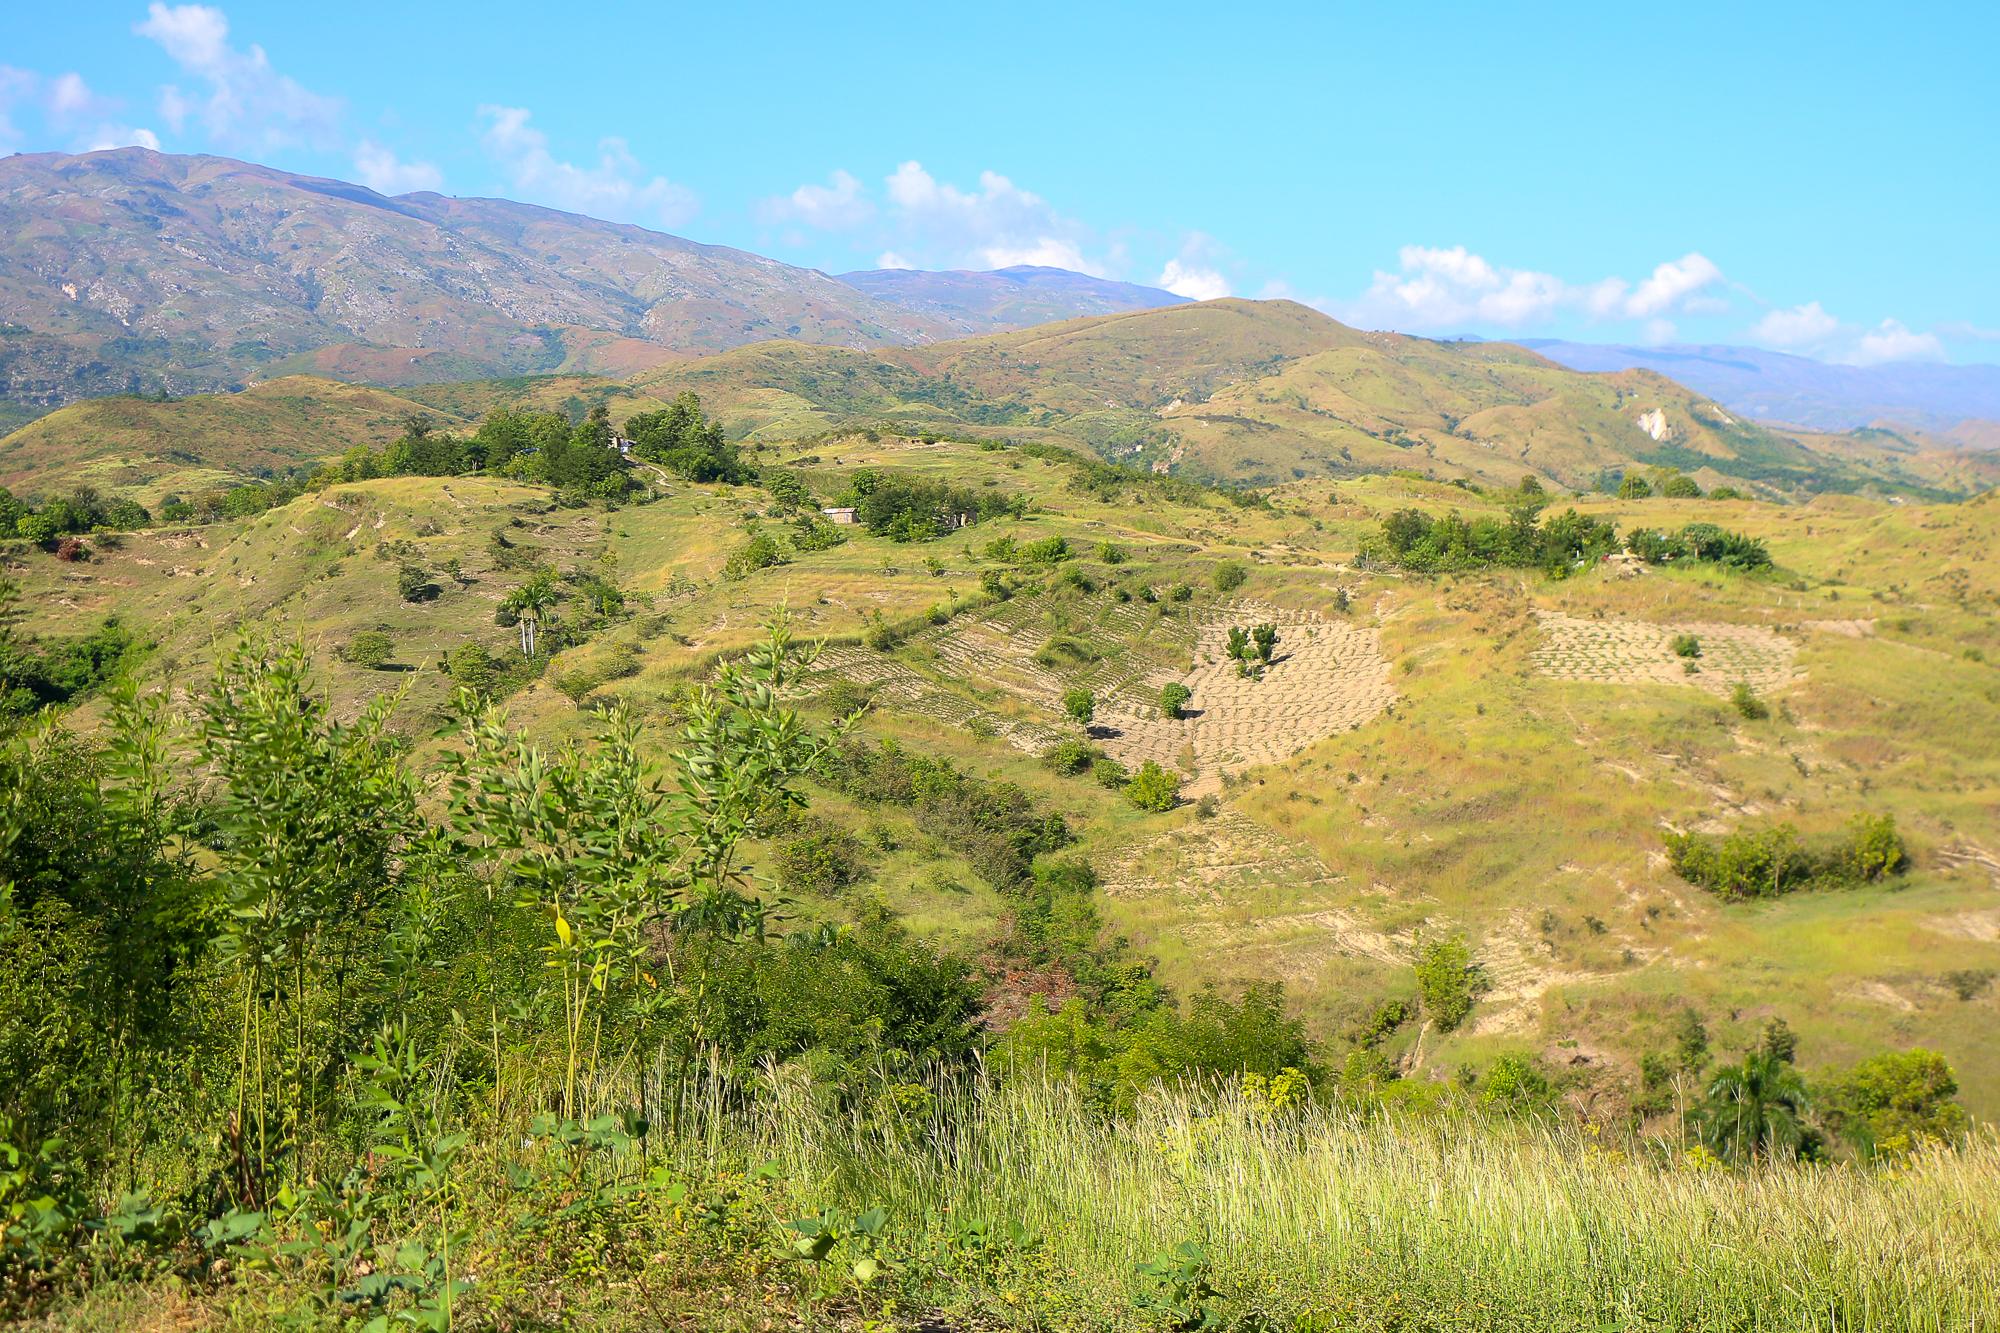 Kabay, Haiti. MCC Photo/Annalee Giesbrecht